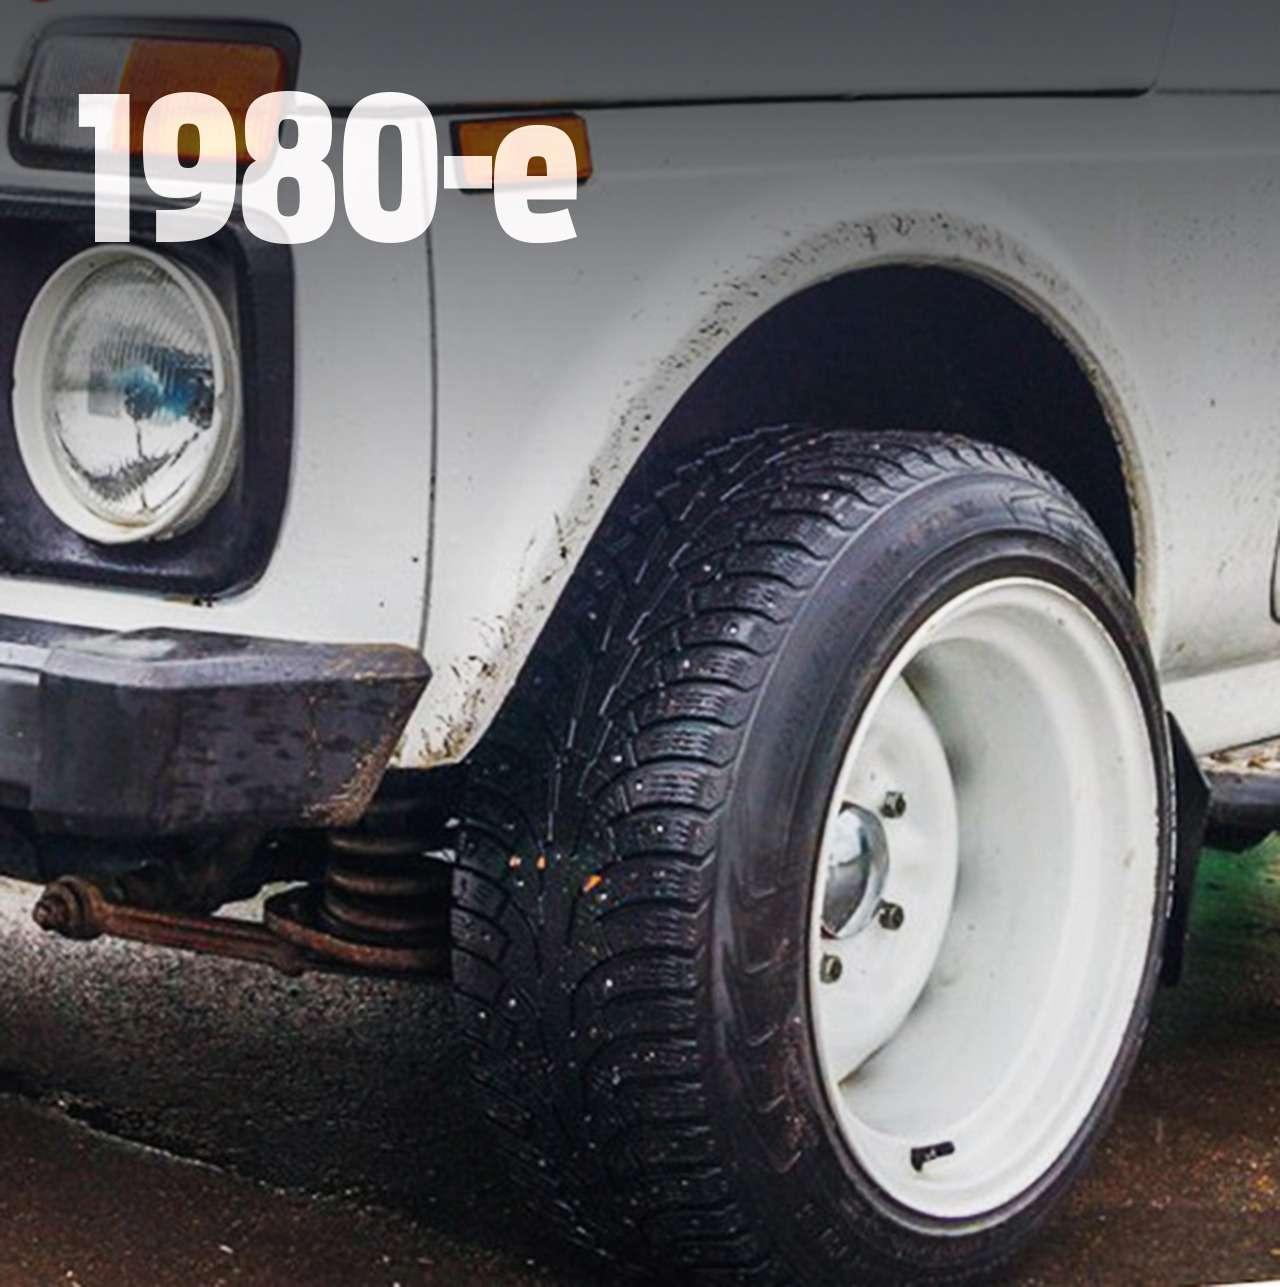 Тюнинг по-русски: отоплеток 60-х годов досиних писалок— фото 904317